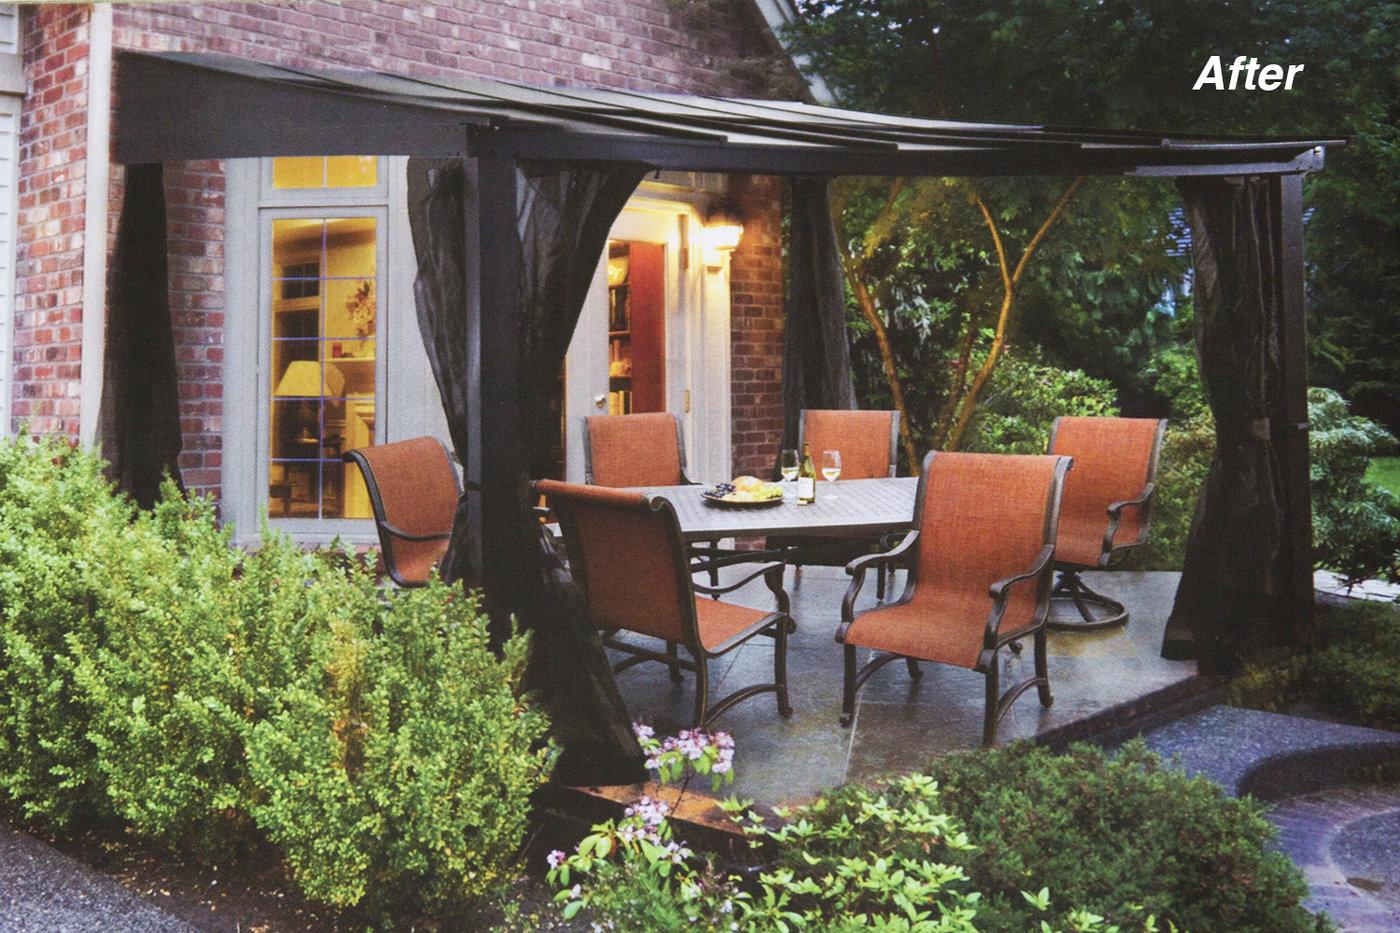 sterling home patio catalogs flyers artwork website menards rh coroflot com sterling home and patio reviews sterling home and patio orleans collection